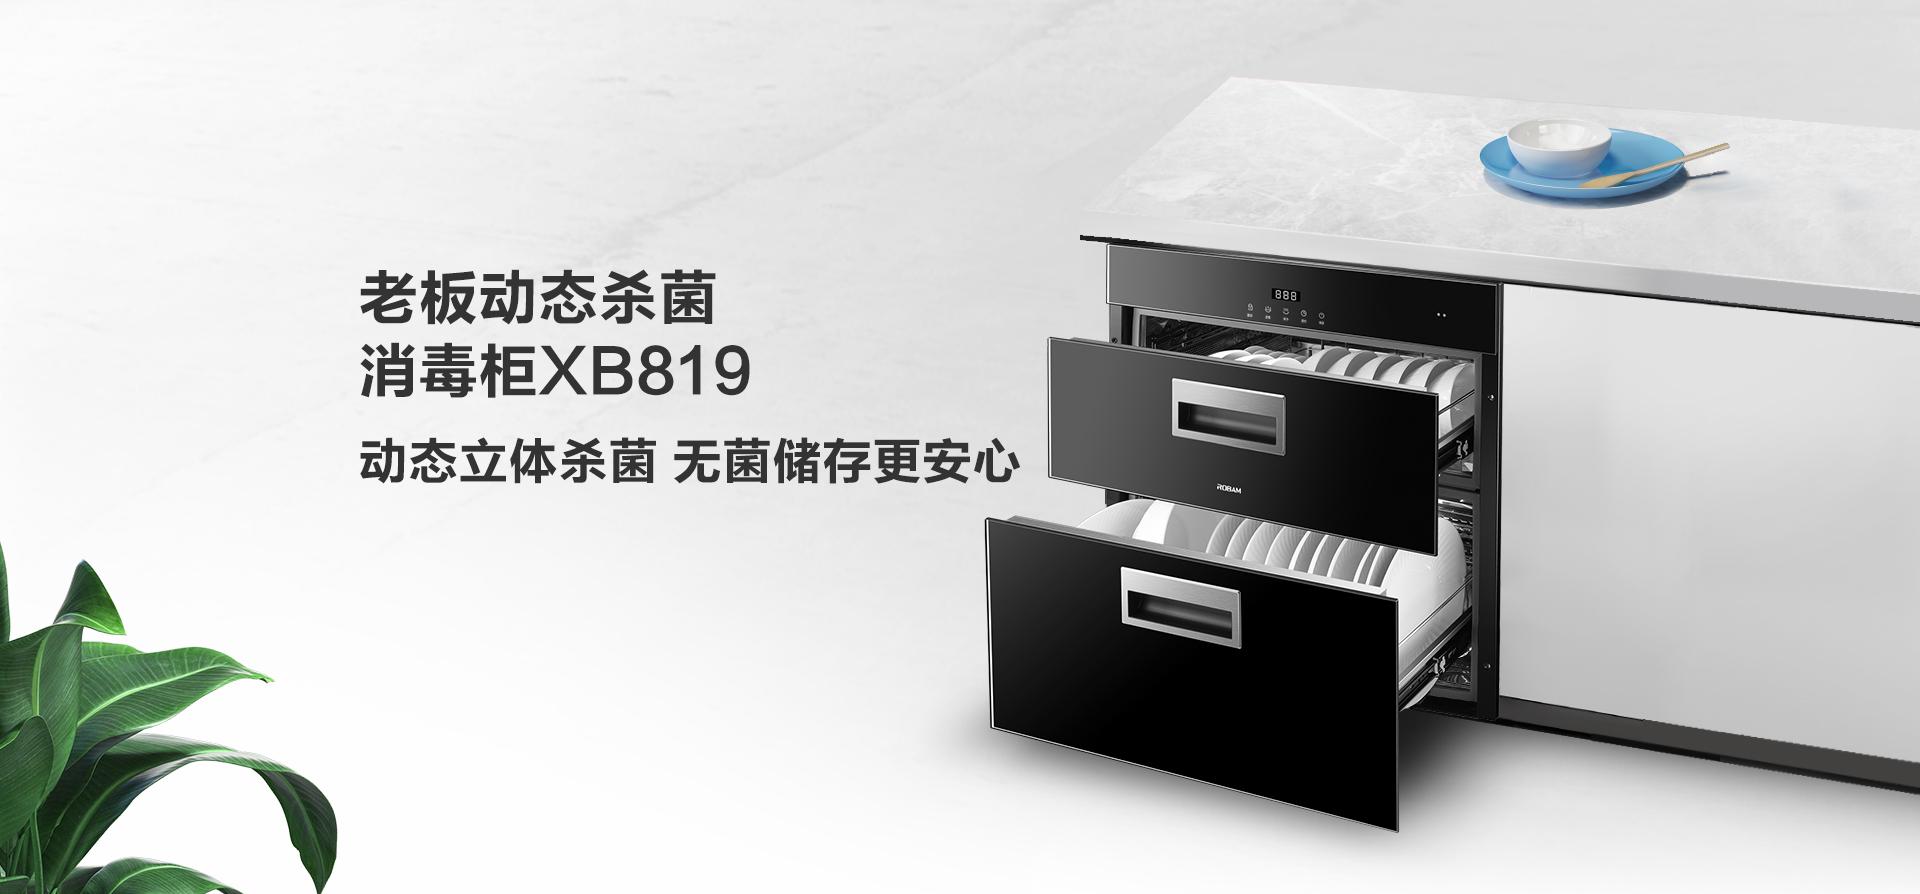 XB819消毒柜官网上新-201116_01.png